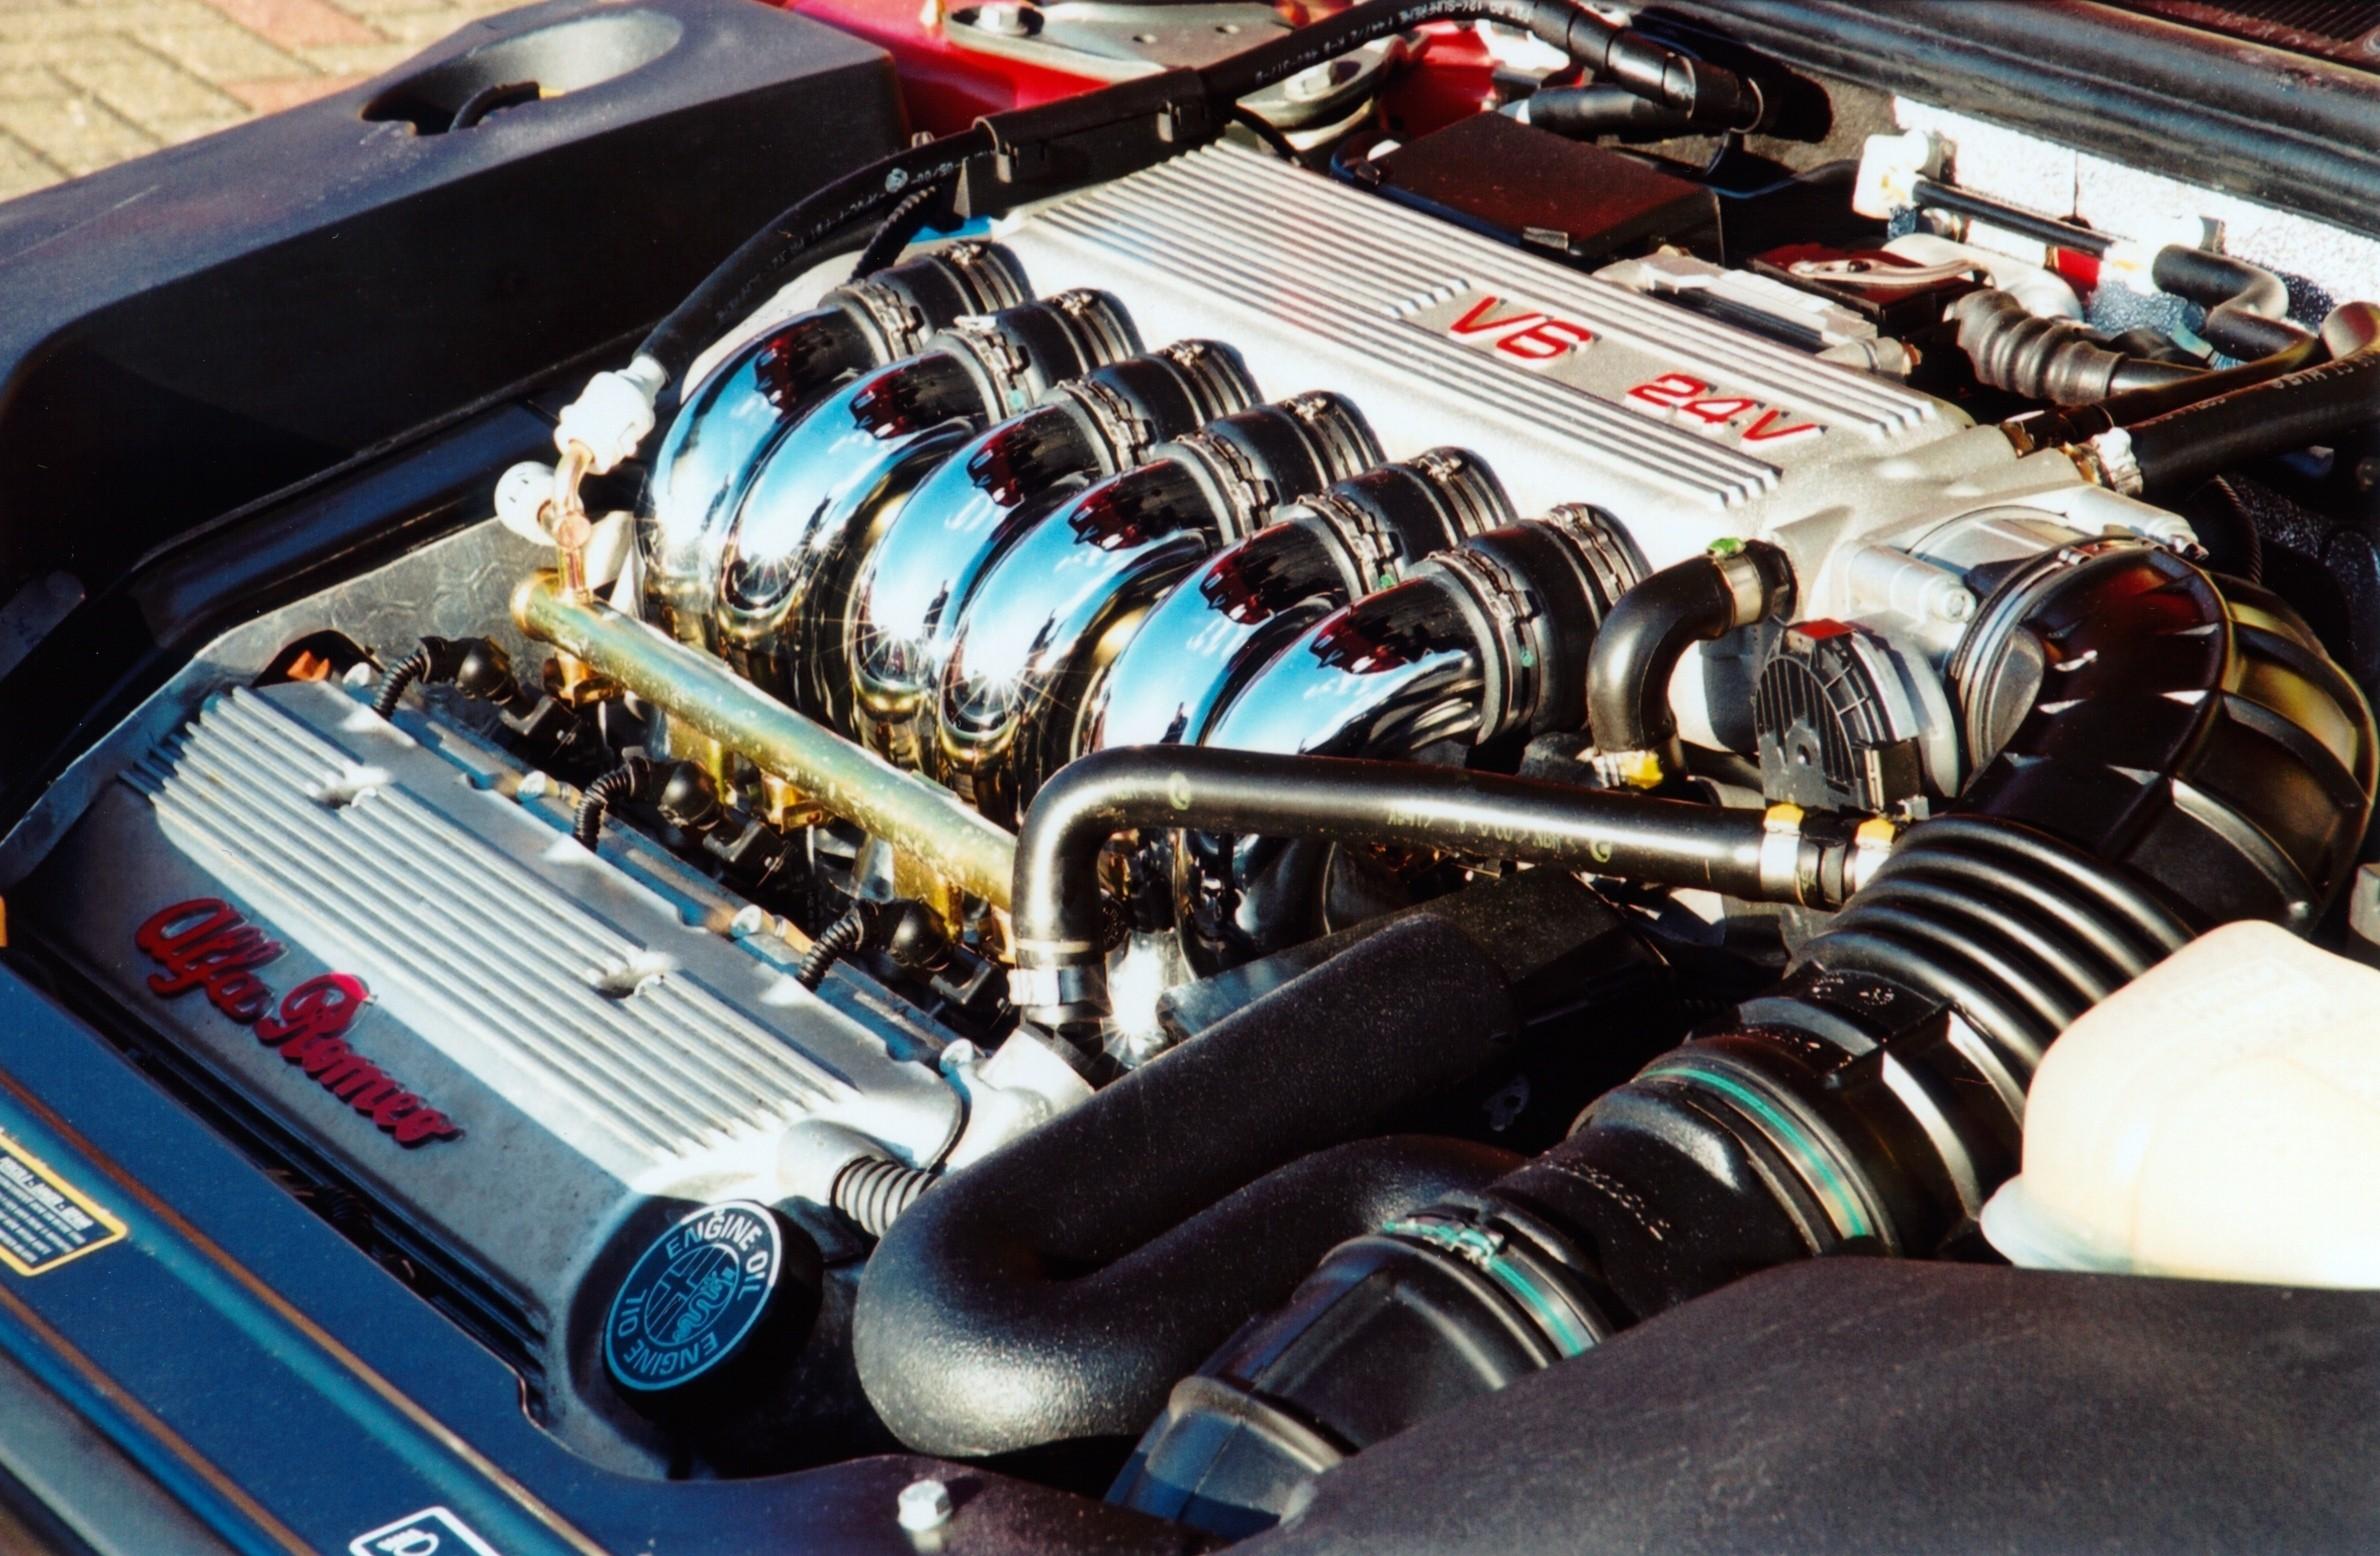 2015 Ferrari 458 Speciale >> Alfa Romeo Spider 3.0 V6 24v 2001 - Picture 13431